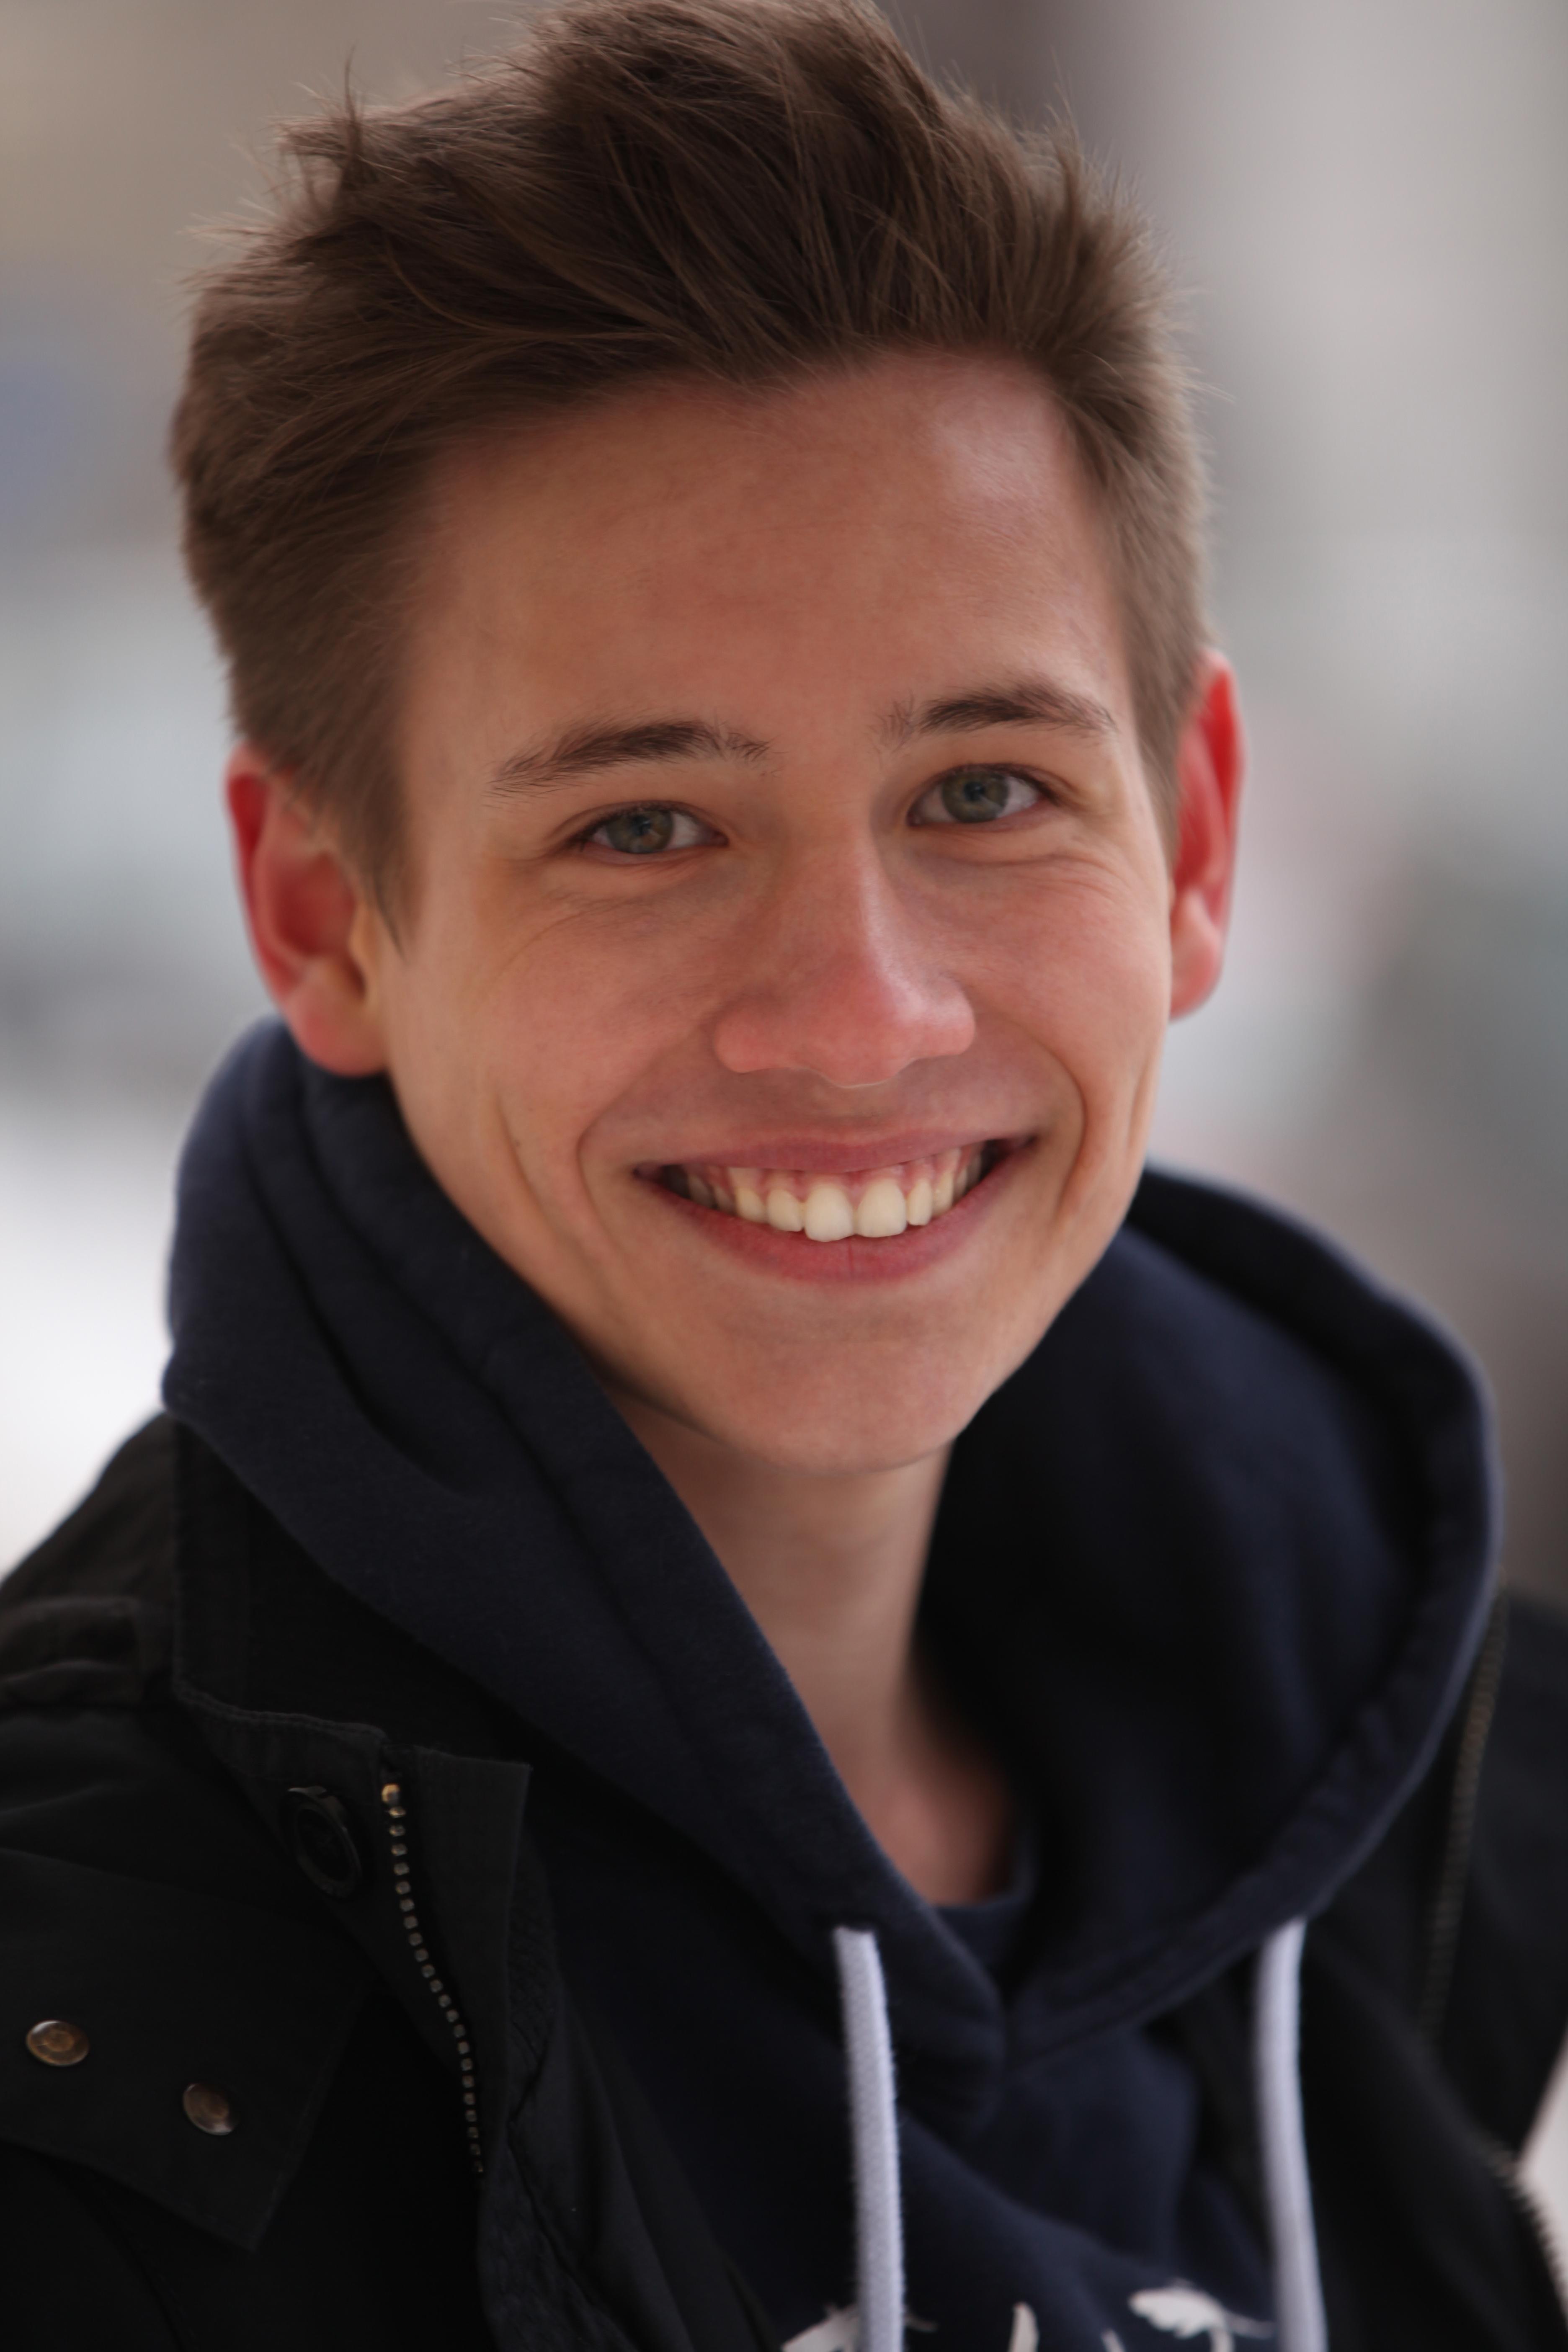 Adrian Bräunig